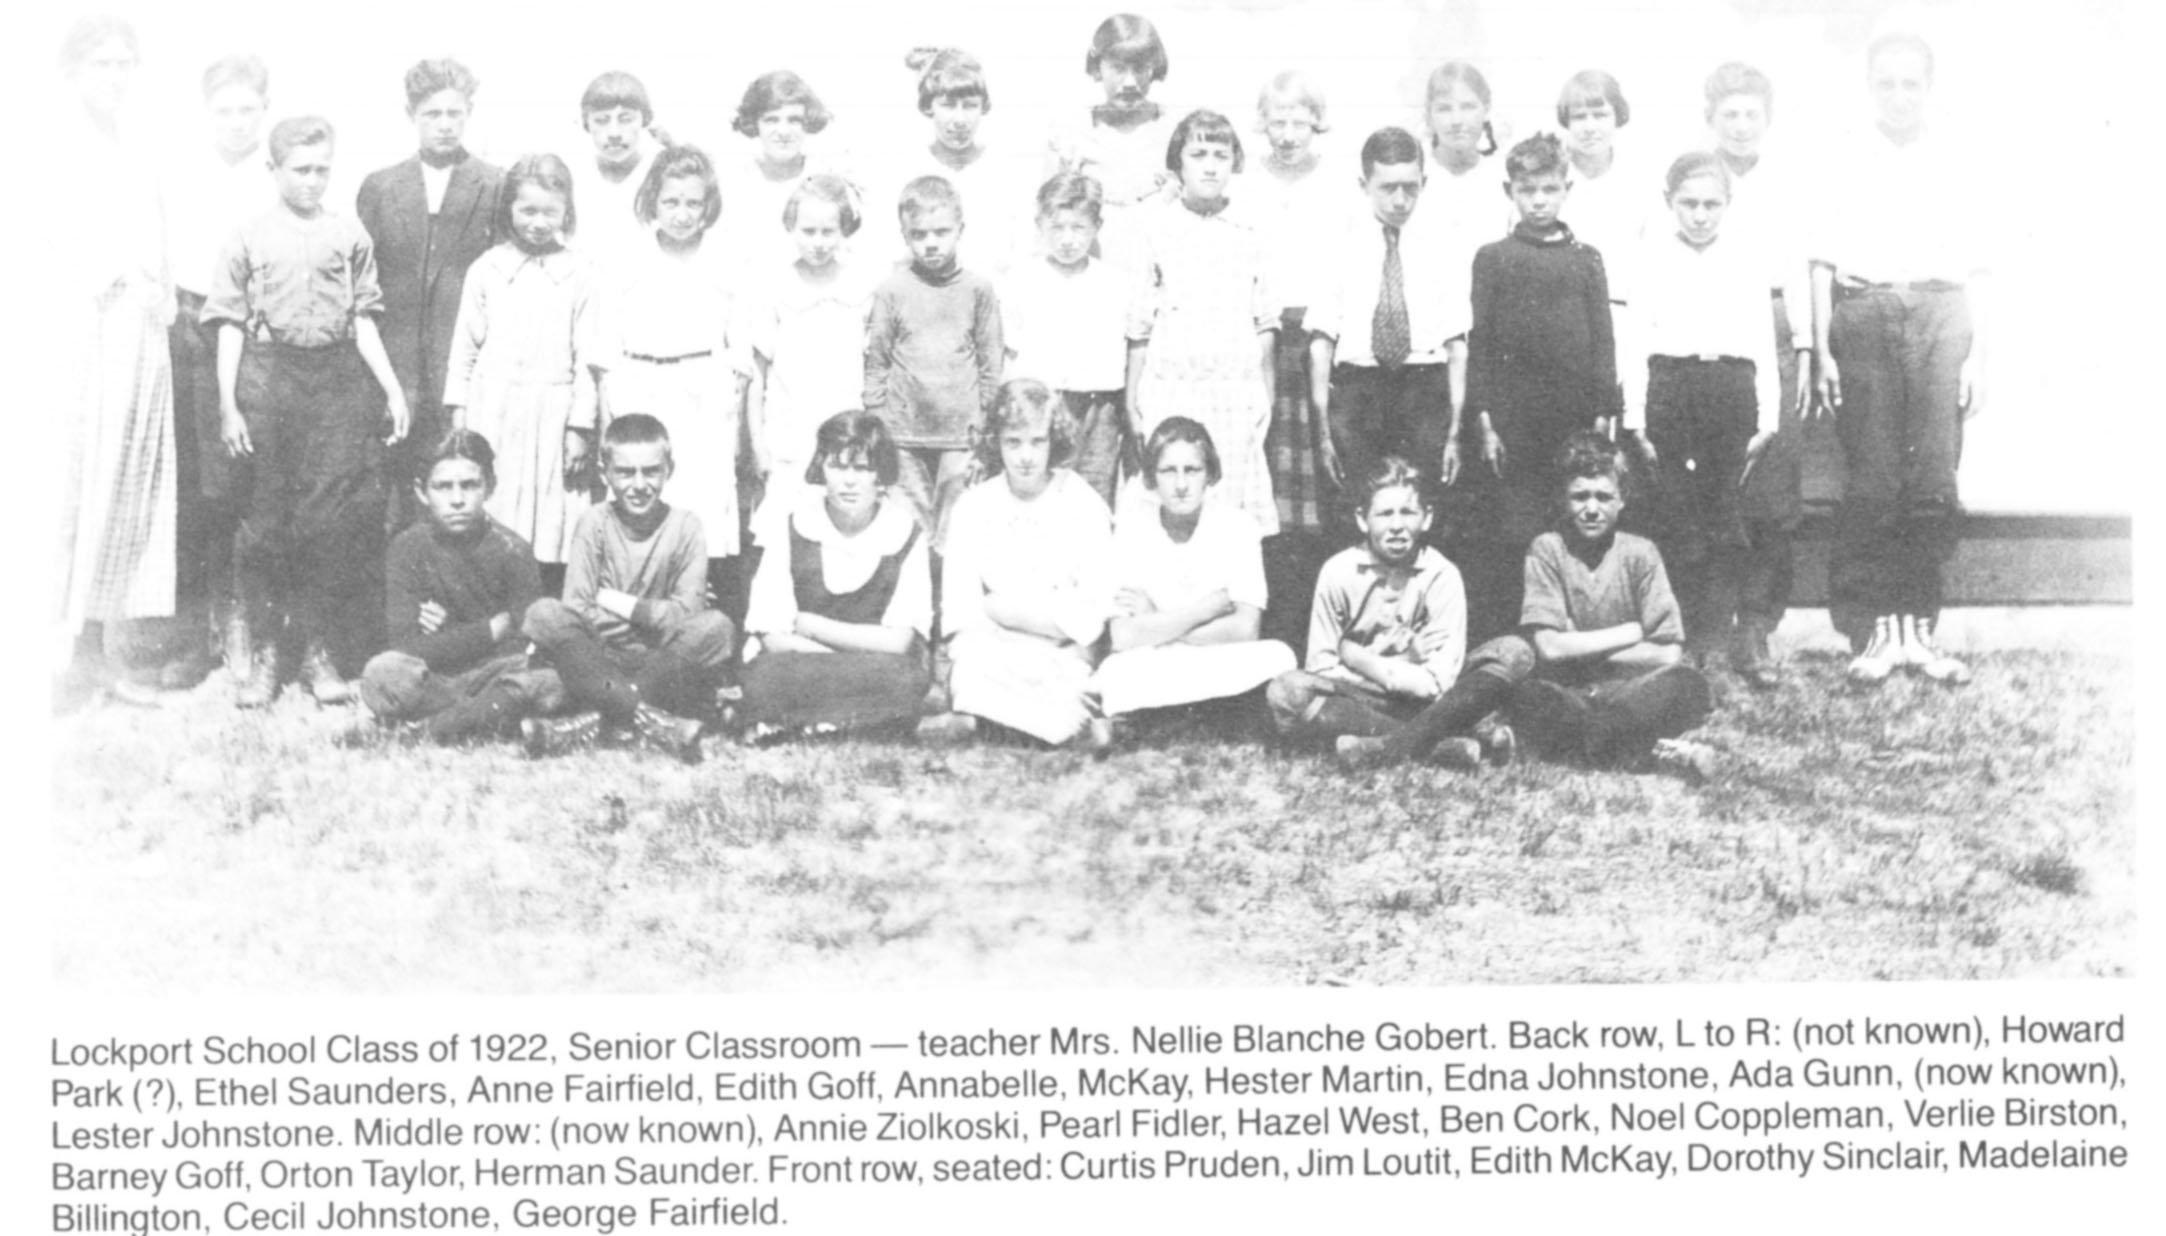 Lockport School 1922